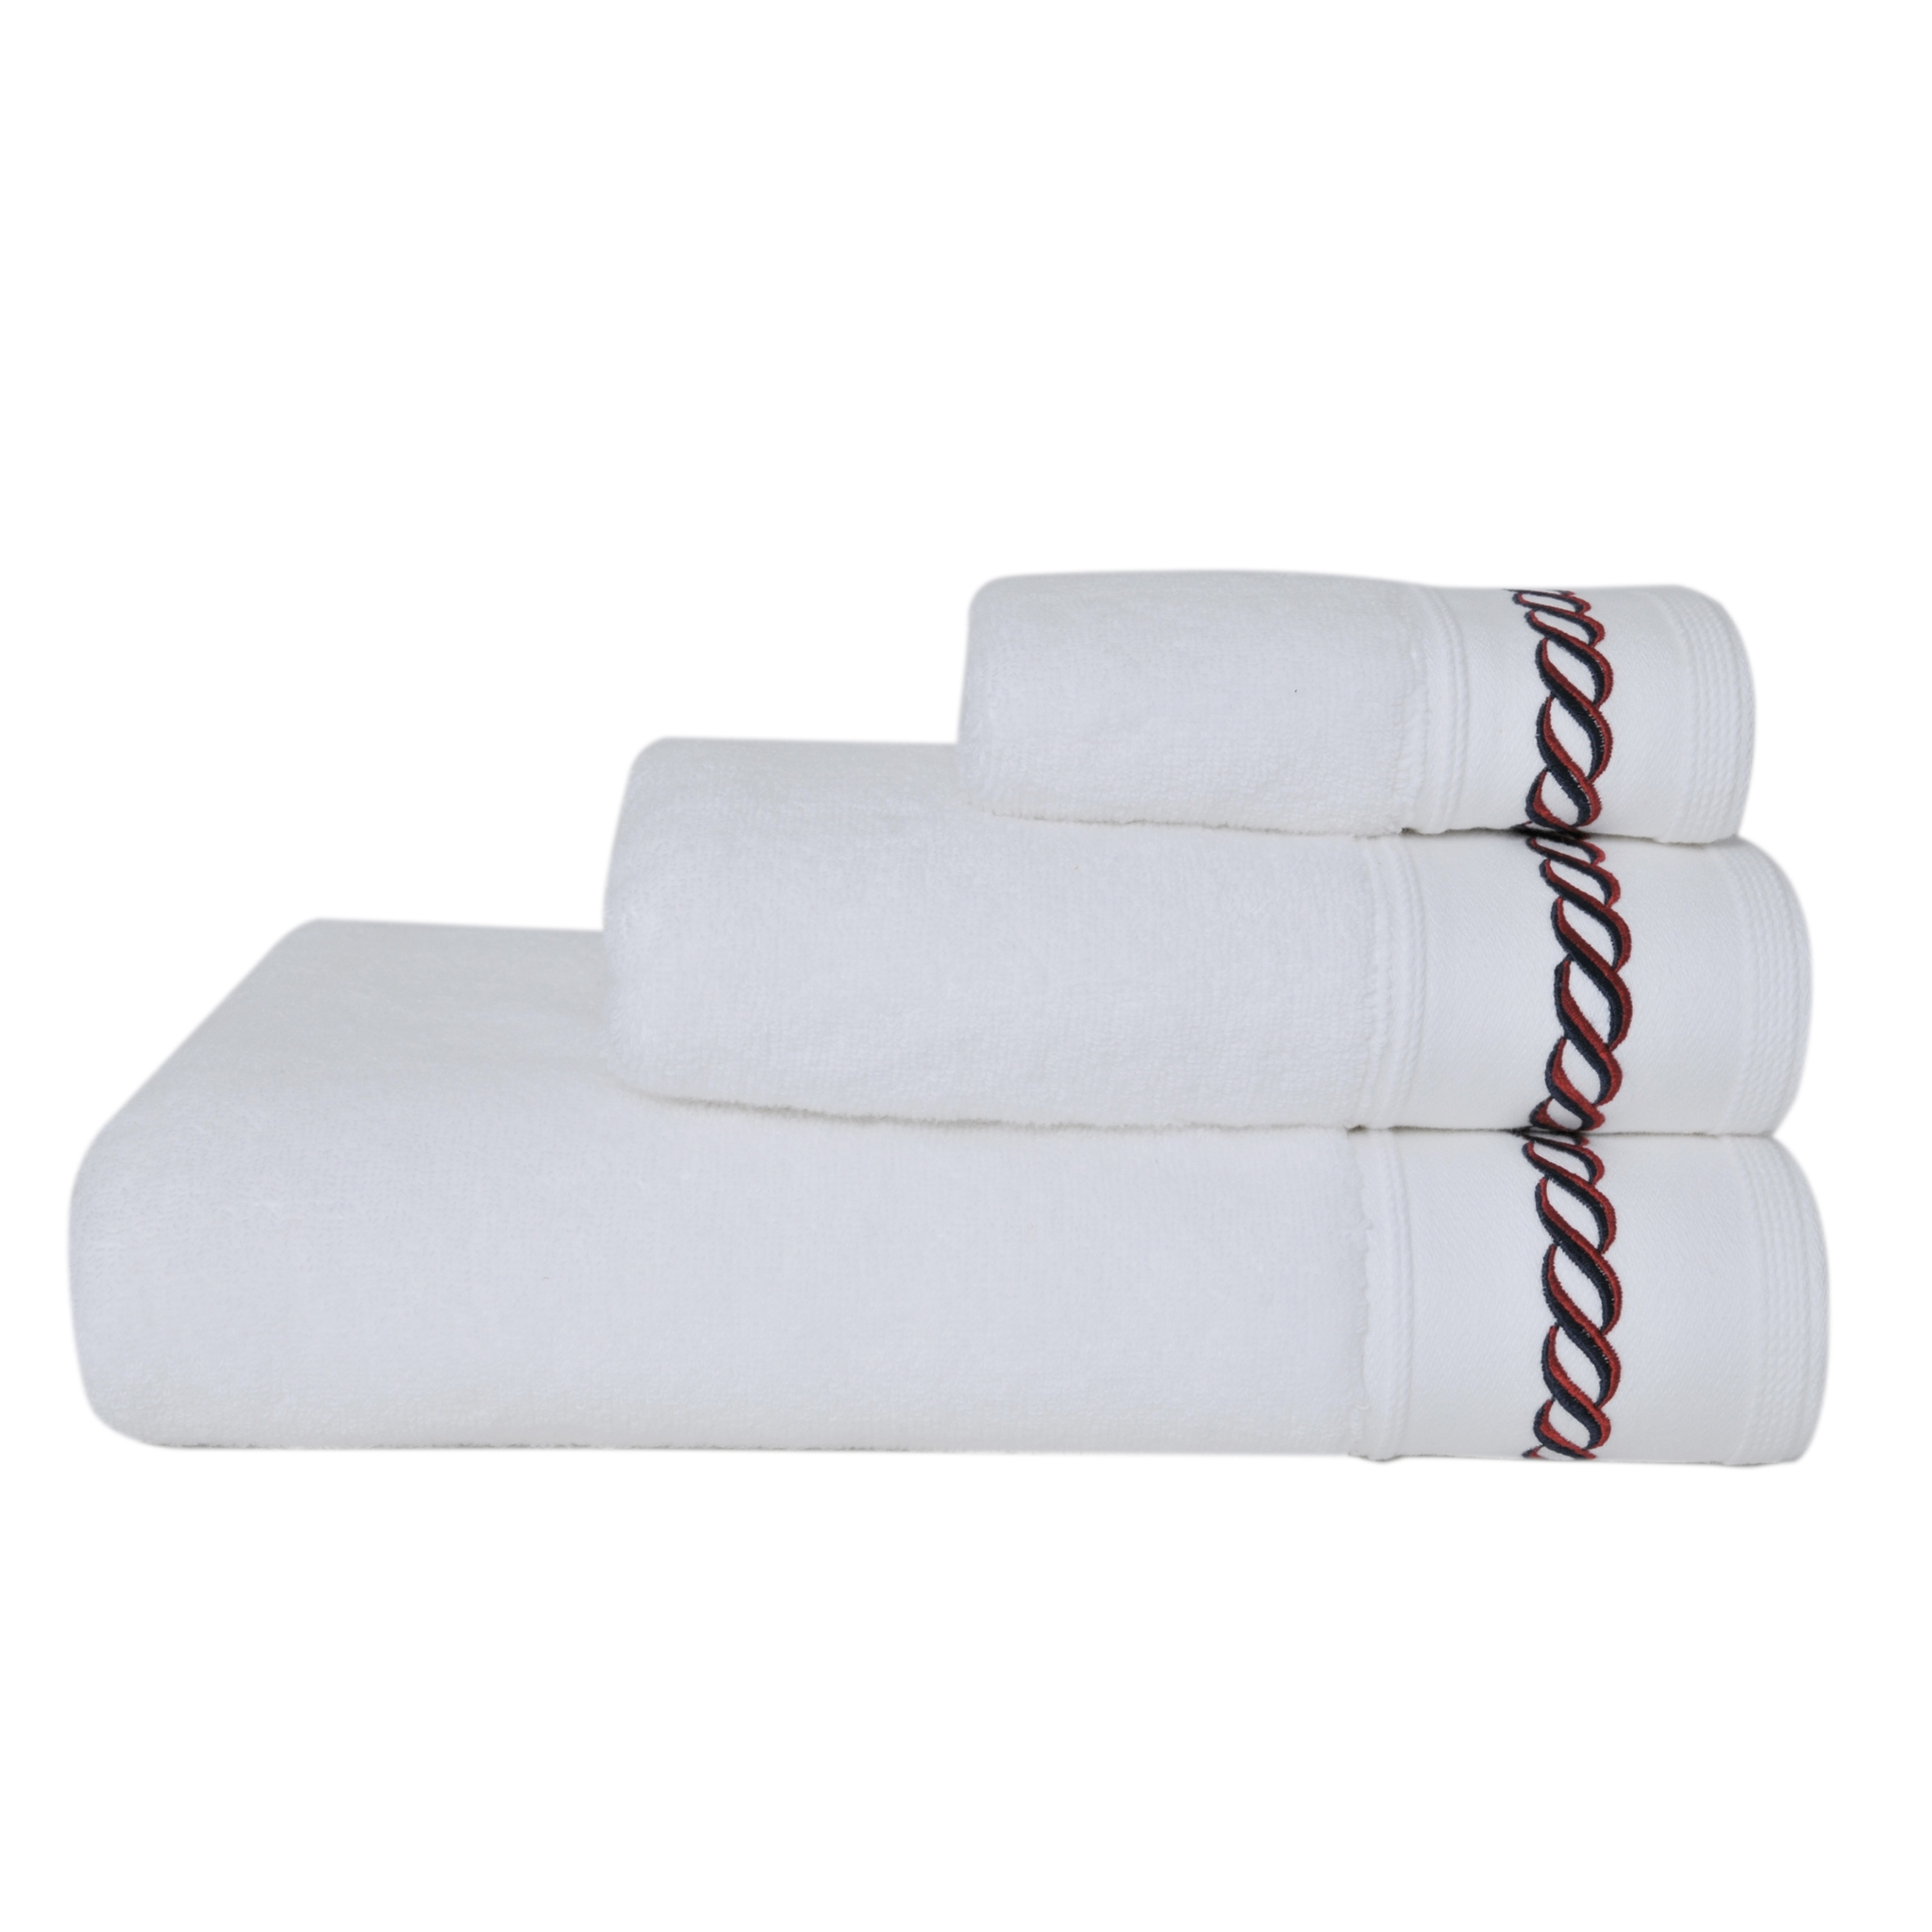 Полотенца Полотенце 30x50 Casual Avenue Messina белое с цветным polotentse-50x100-casual-avenue-messina-beloe-s-tsvetnym-turtsiya.jpg